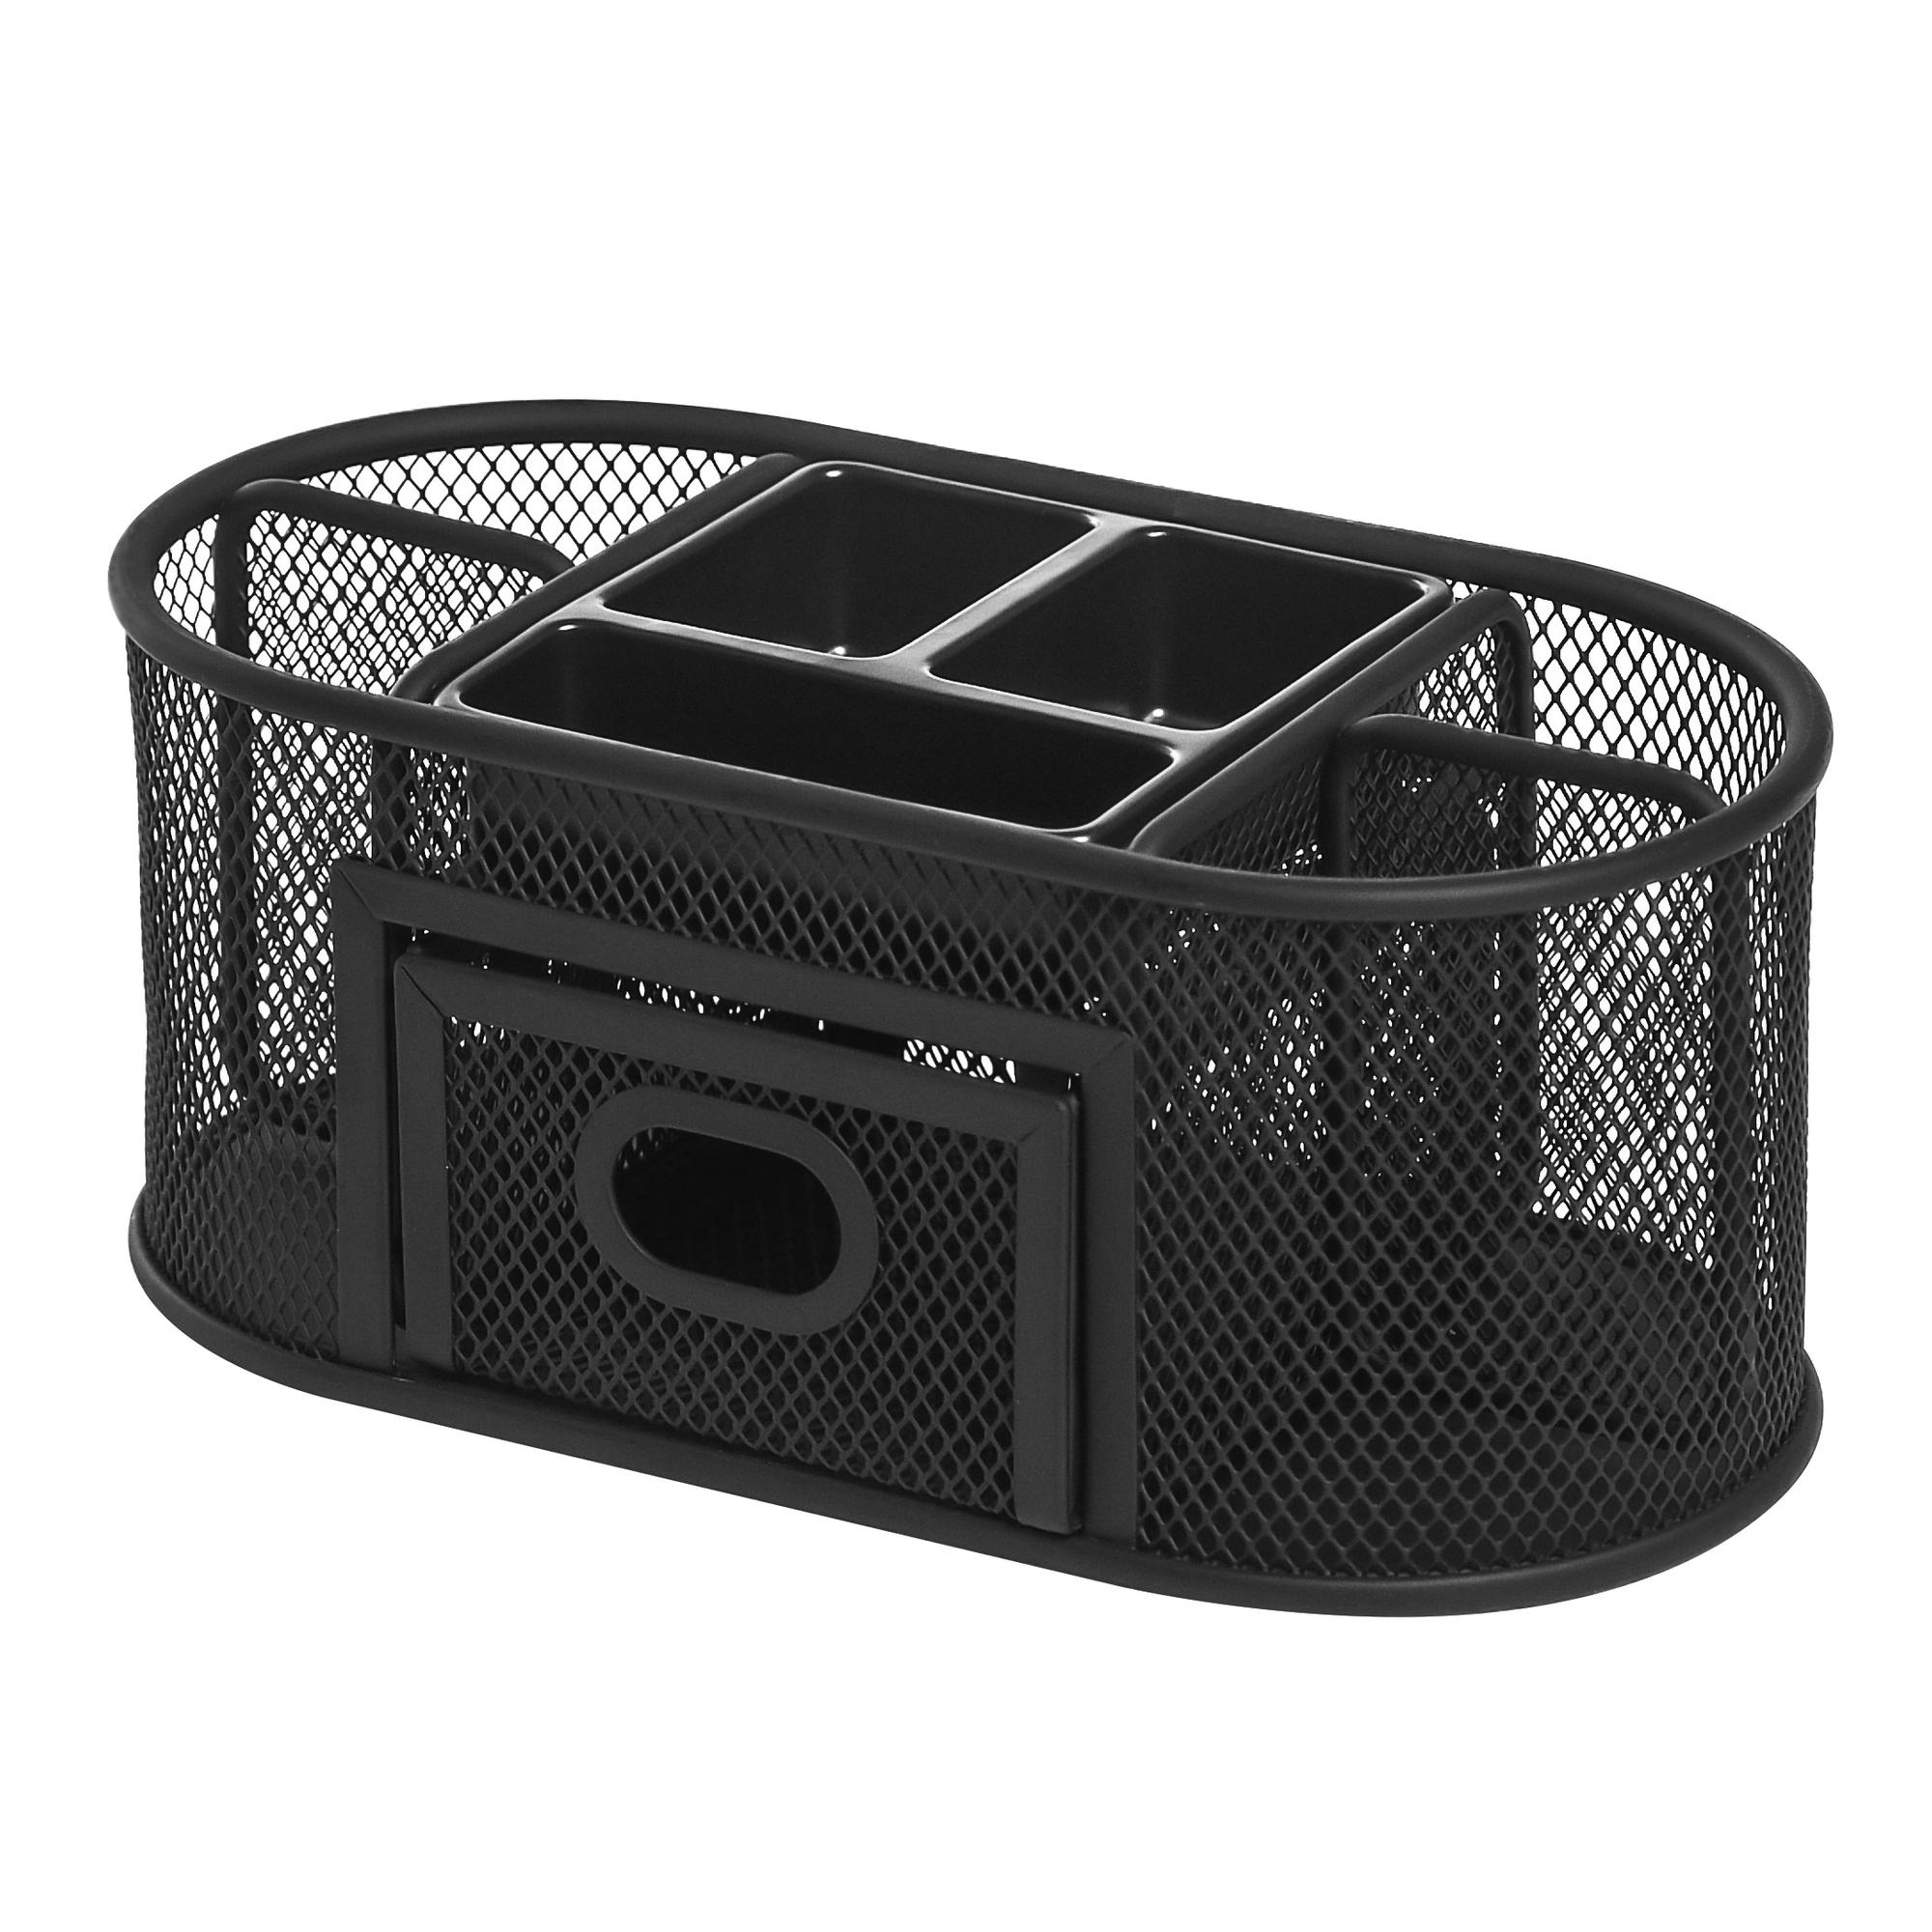 Lorell Mesh Steel Desktop Organizer Black Plastic 1each